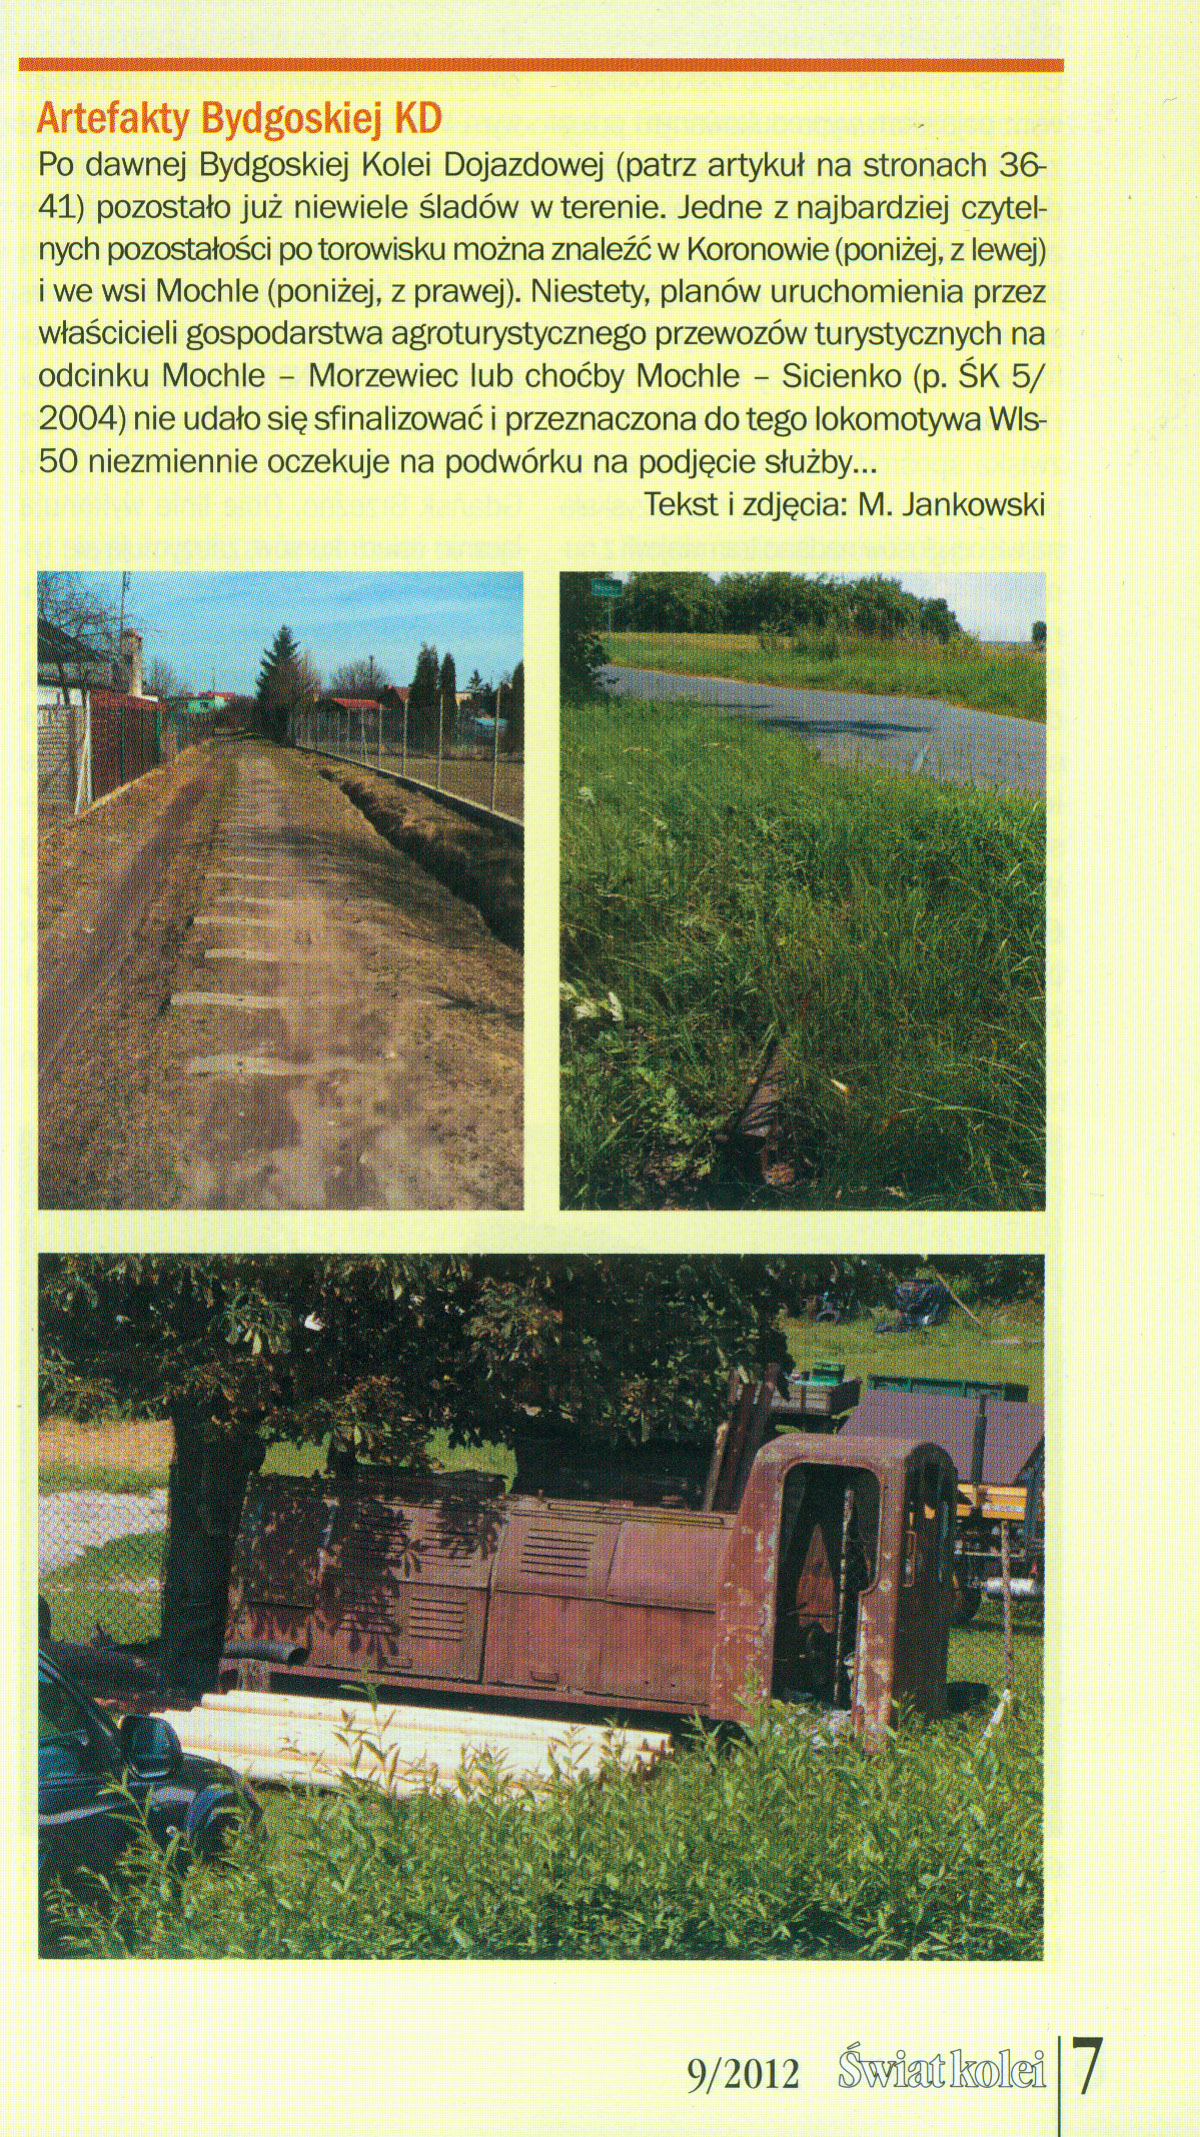 Świat kolei 09/2012